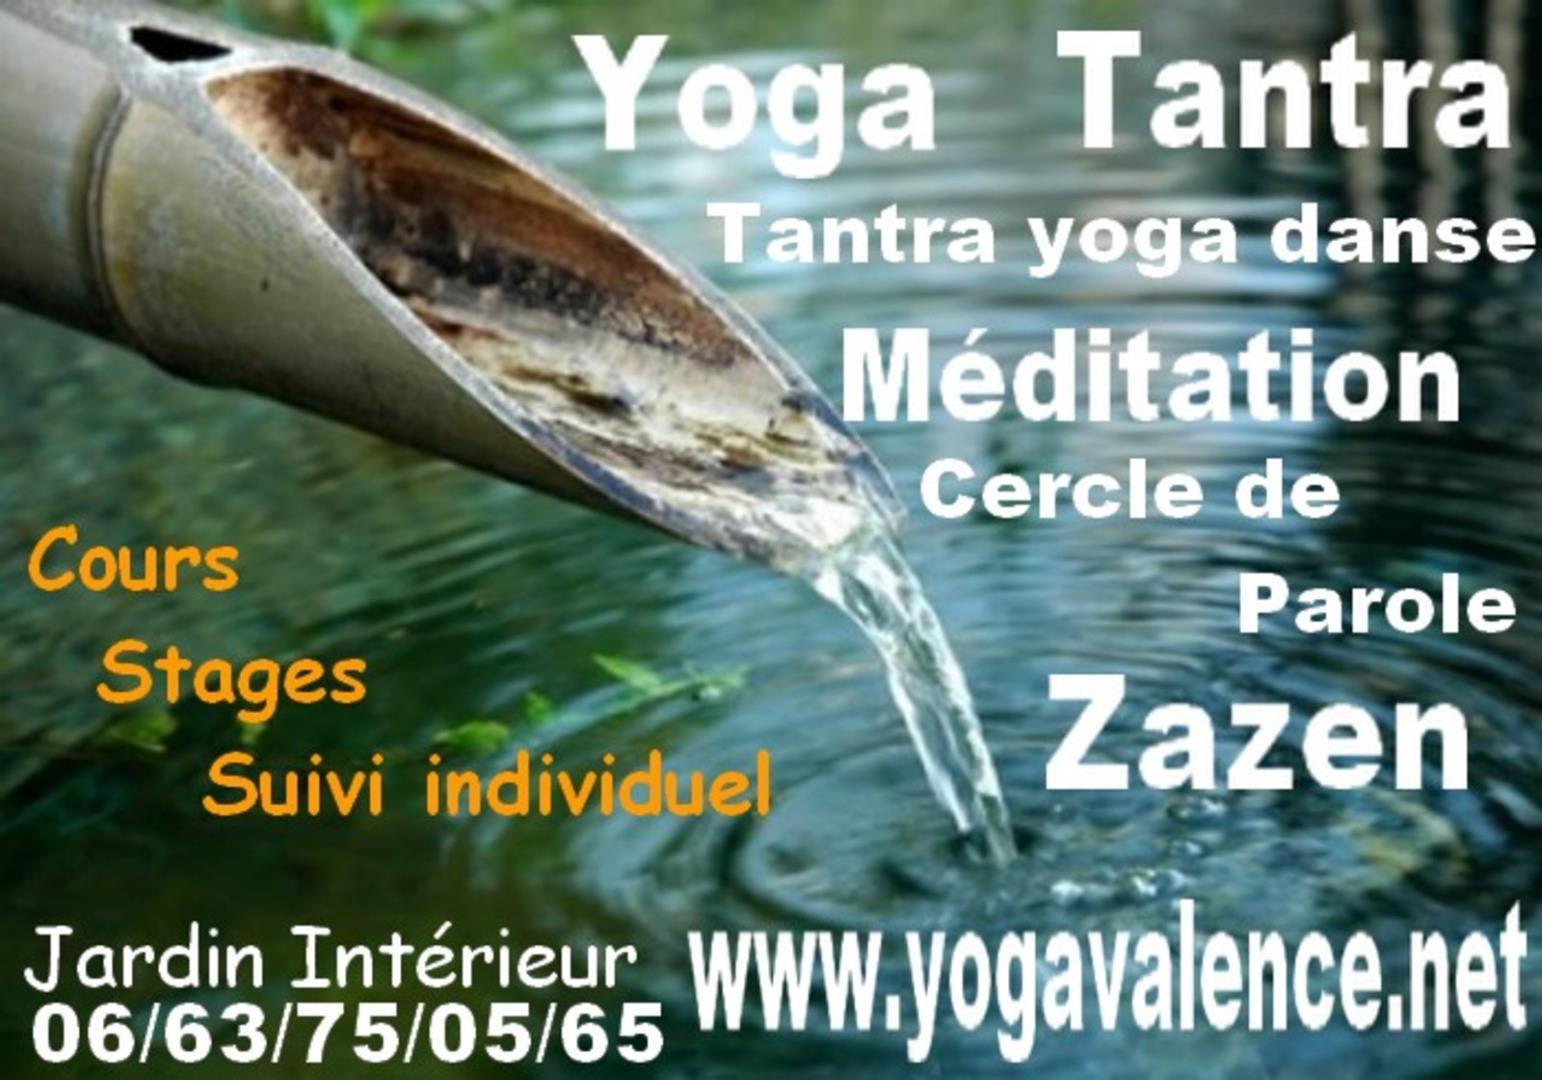 Kundalini Yoga - Association Jardin Intérieur- yoga /tantra